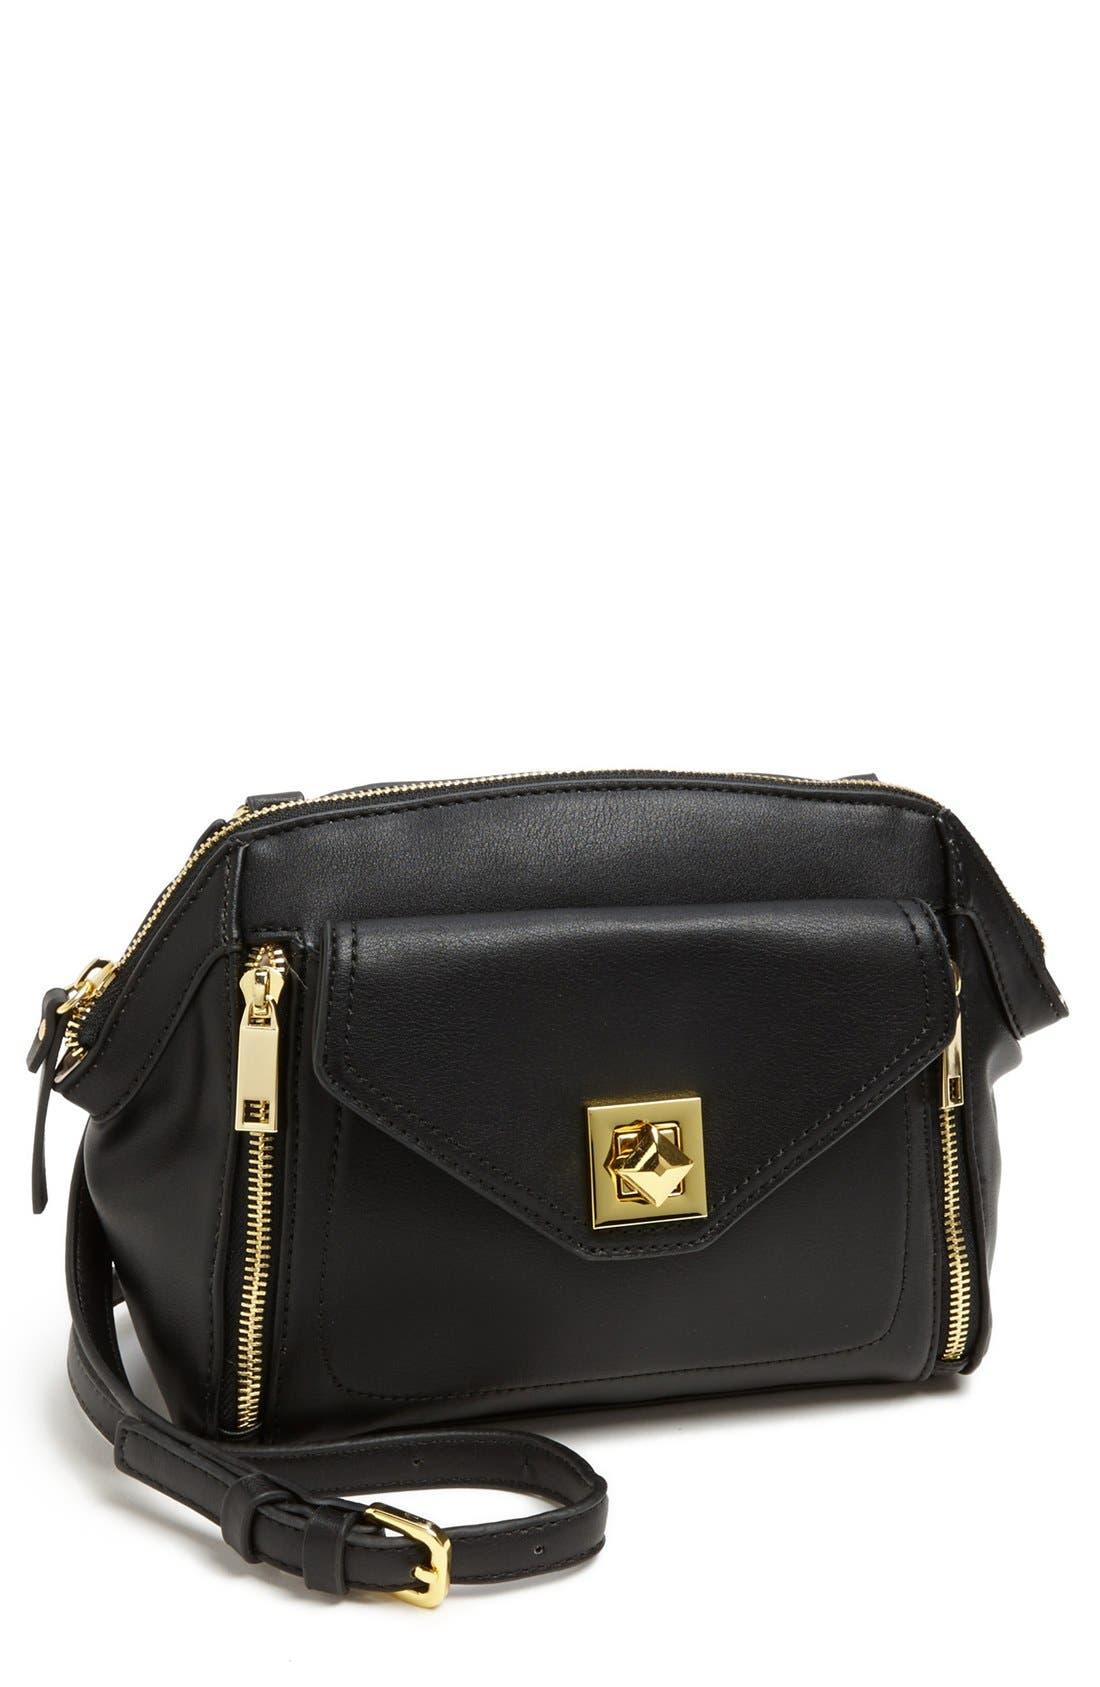 Alternate Image 1 Selected - Jessica Simpson 'Hadley' Crossbody Bag